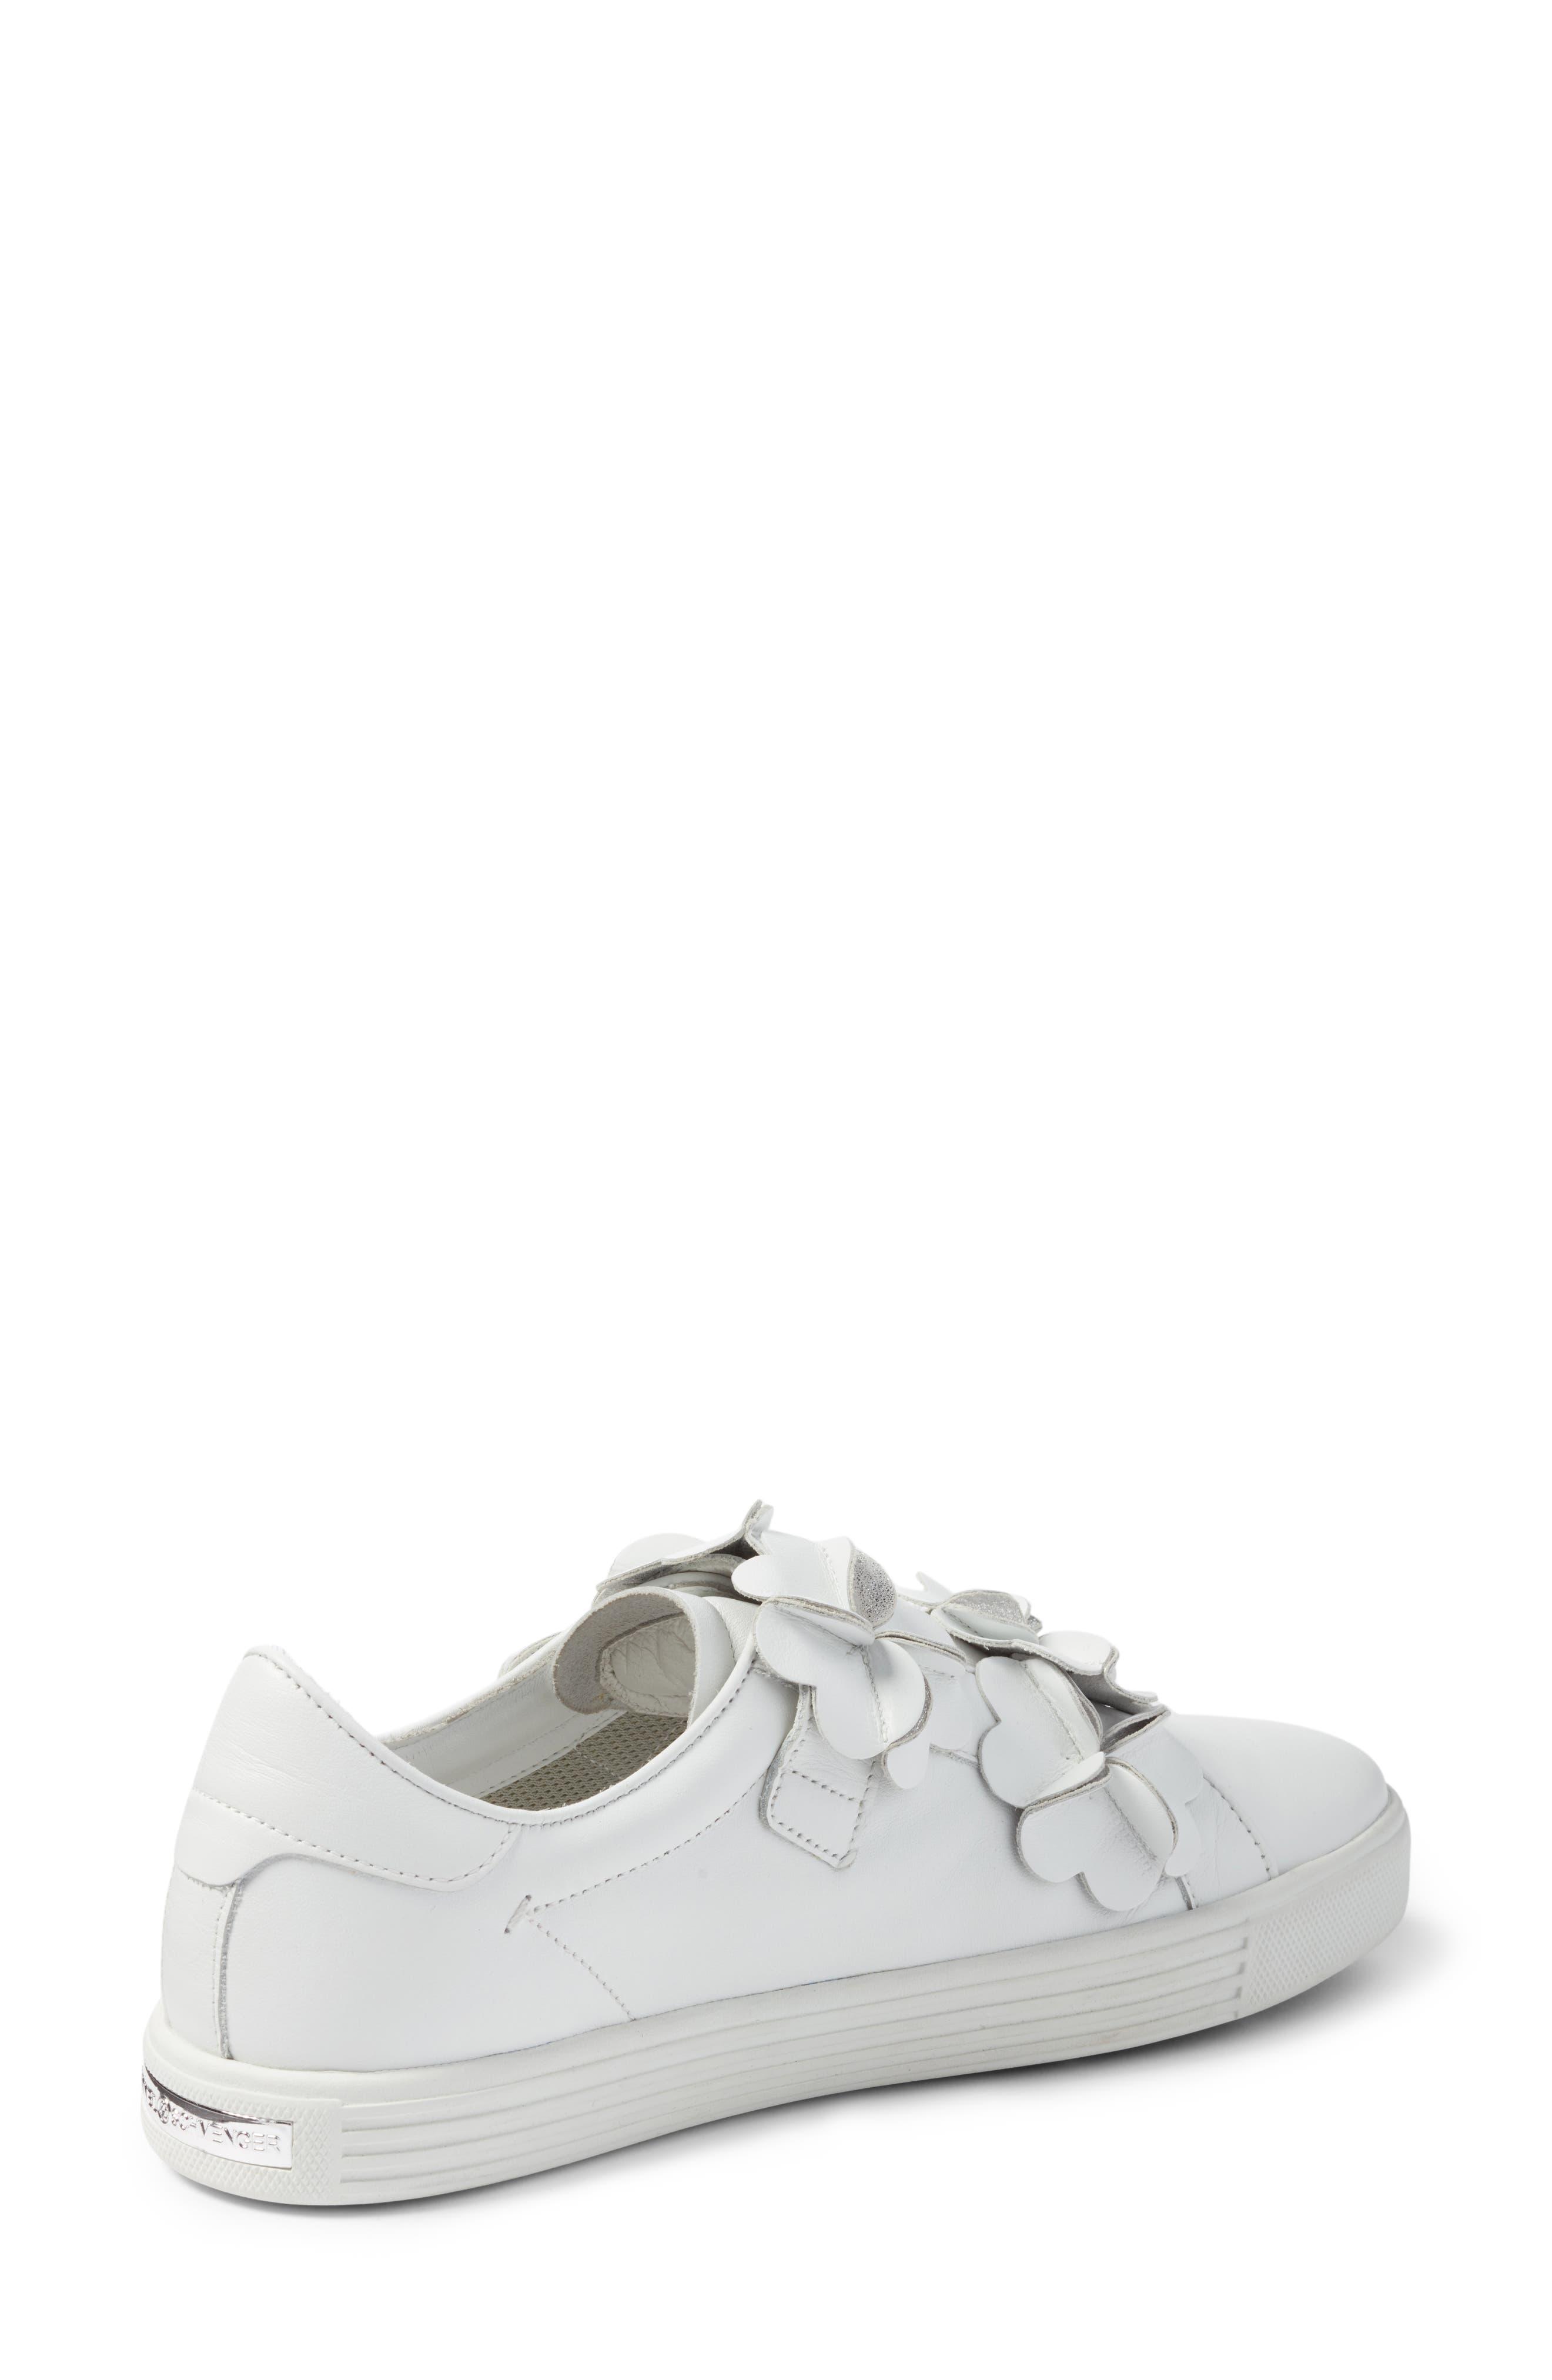 Kennel & Schmenger Town Floral Embellished Sneaker,                             Alternate thumbnail 2, color,                             White/ Silver